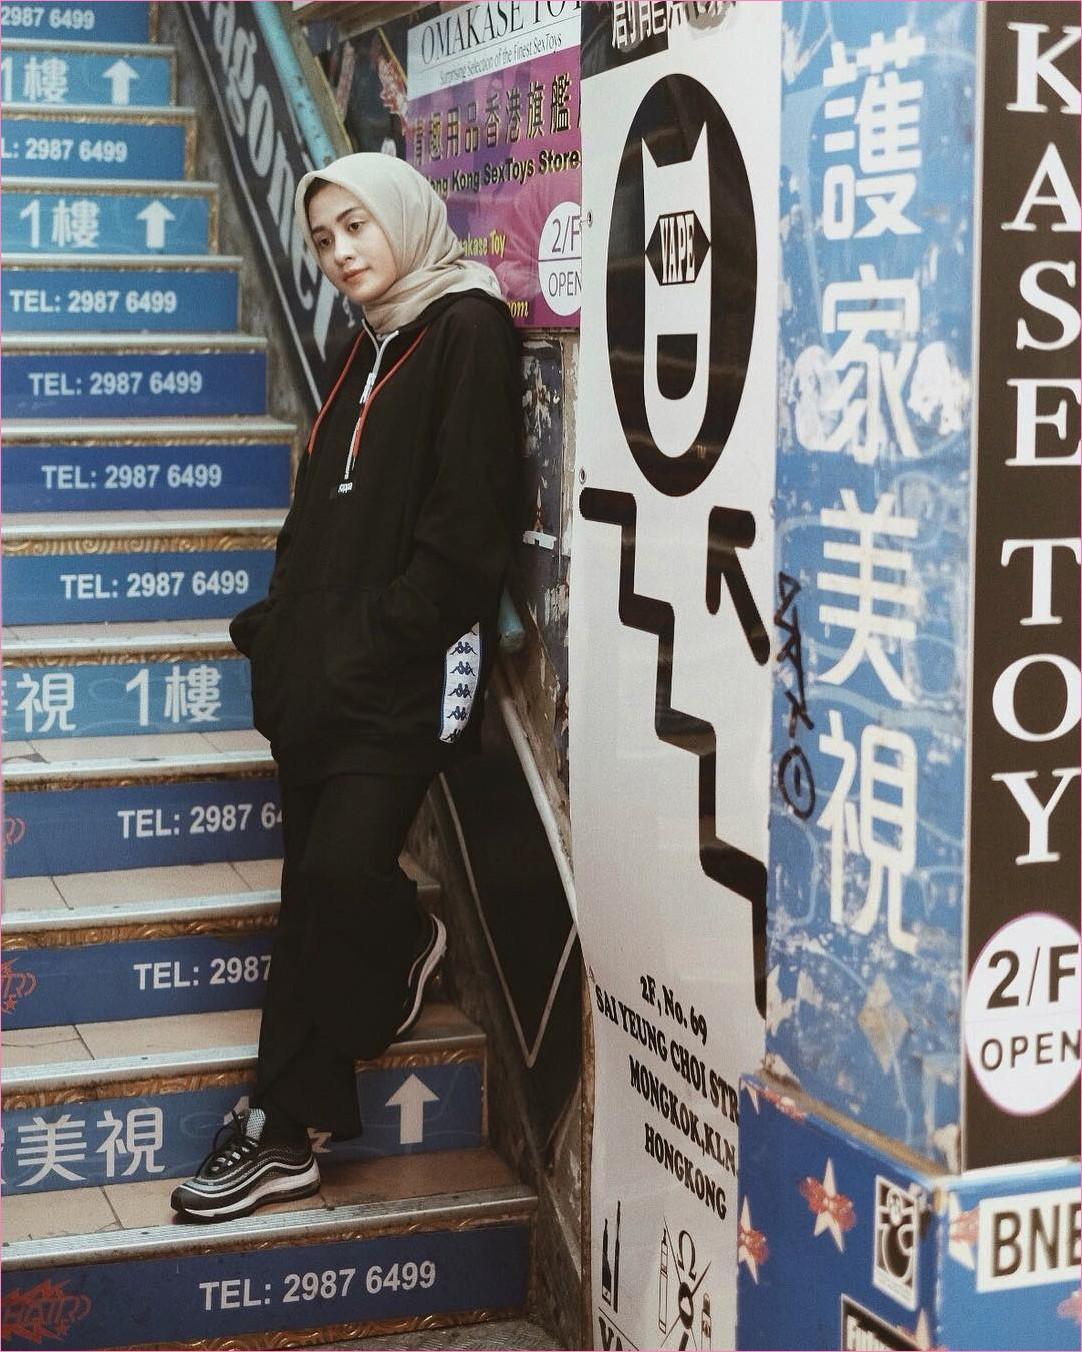 Outfit Baju Hijab Casual Untuk Olahraga Ala Selebgram 2018 sneakers kets sepatu olahraga jaket hoodie sweater hitam gaya casual kain katun rayon jogging goes 2018 hijab segiempat krem tangga selebgram jepang stiker biru muda pink